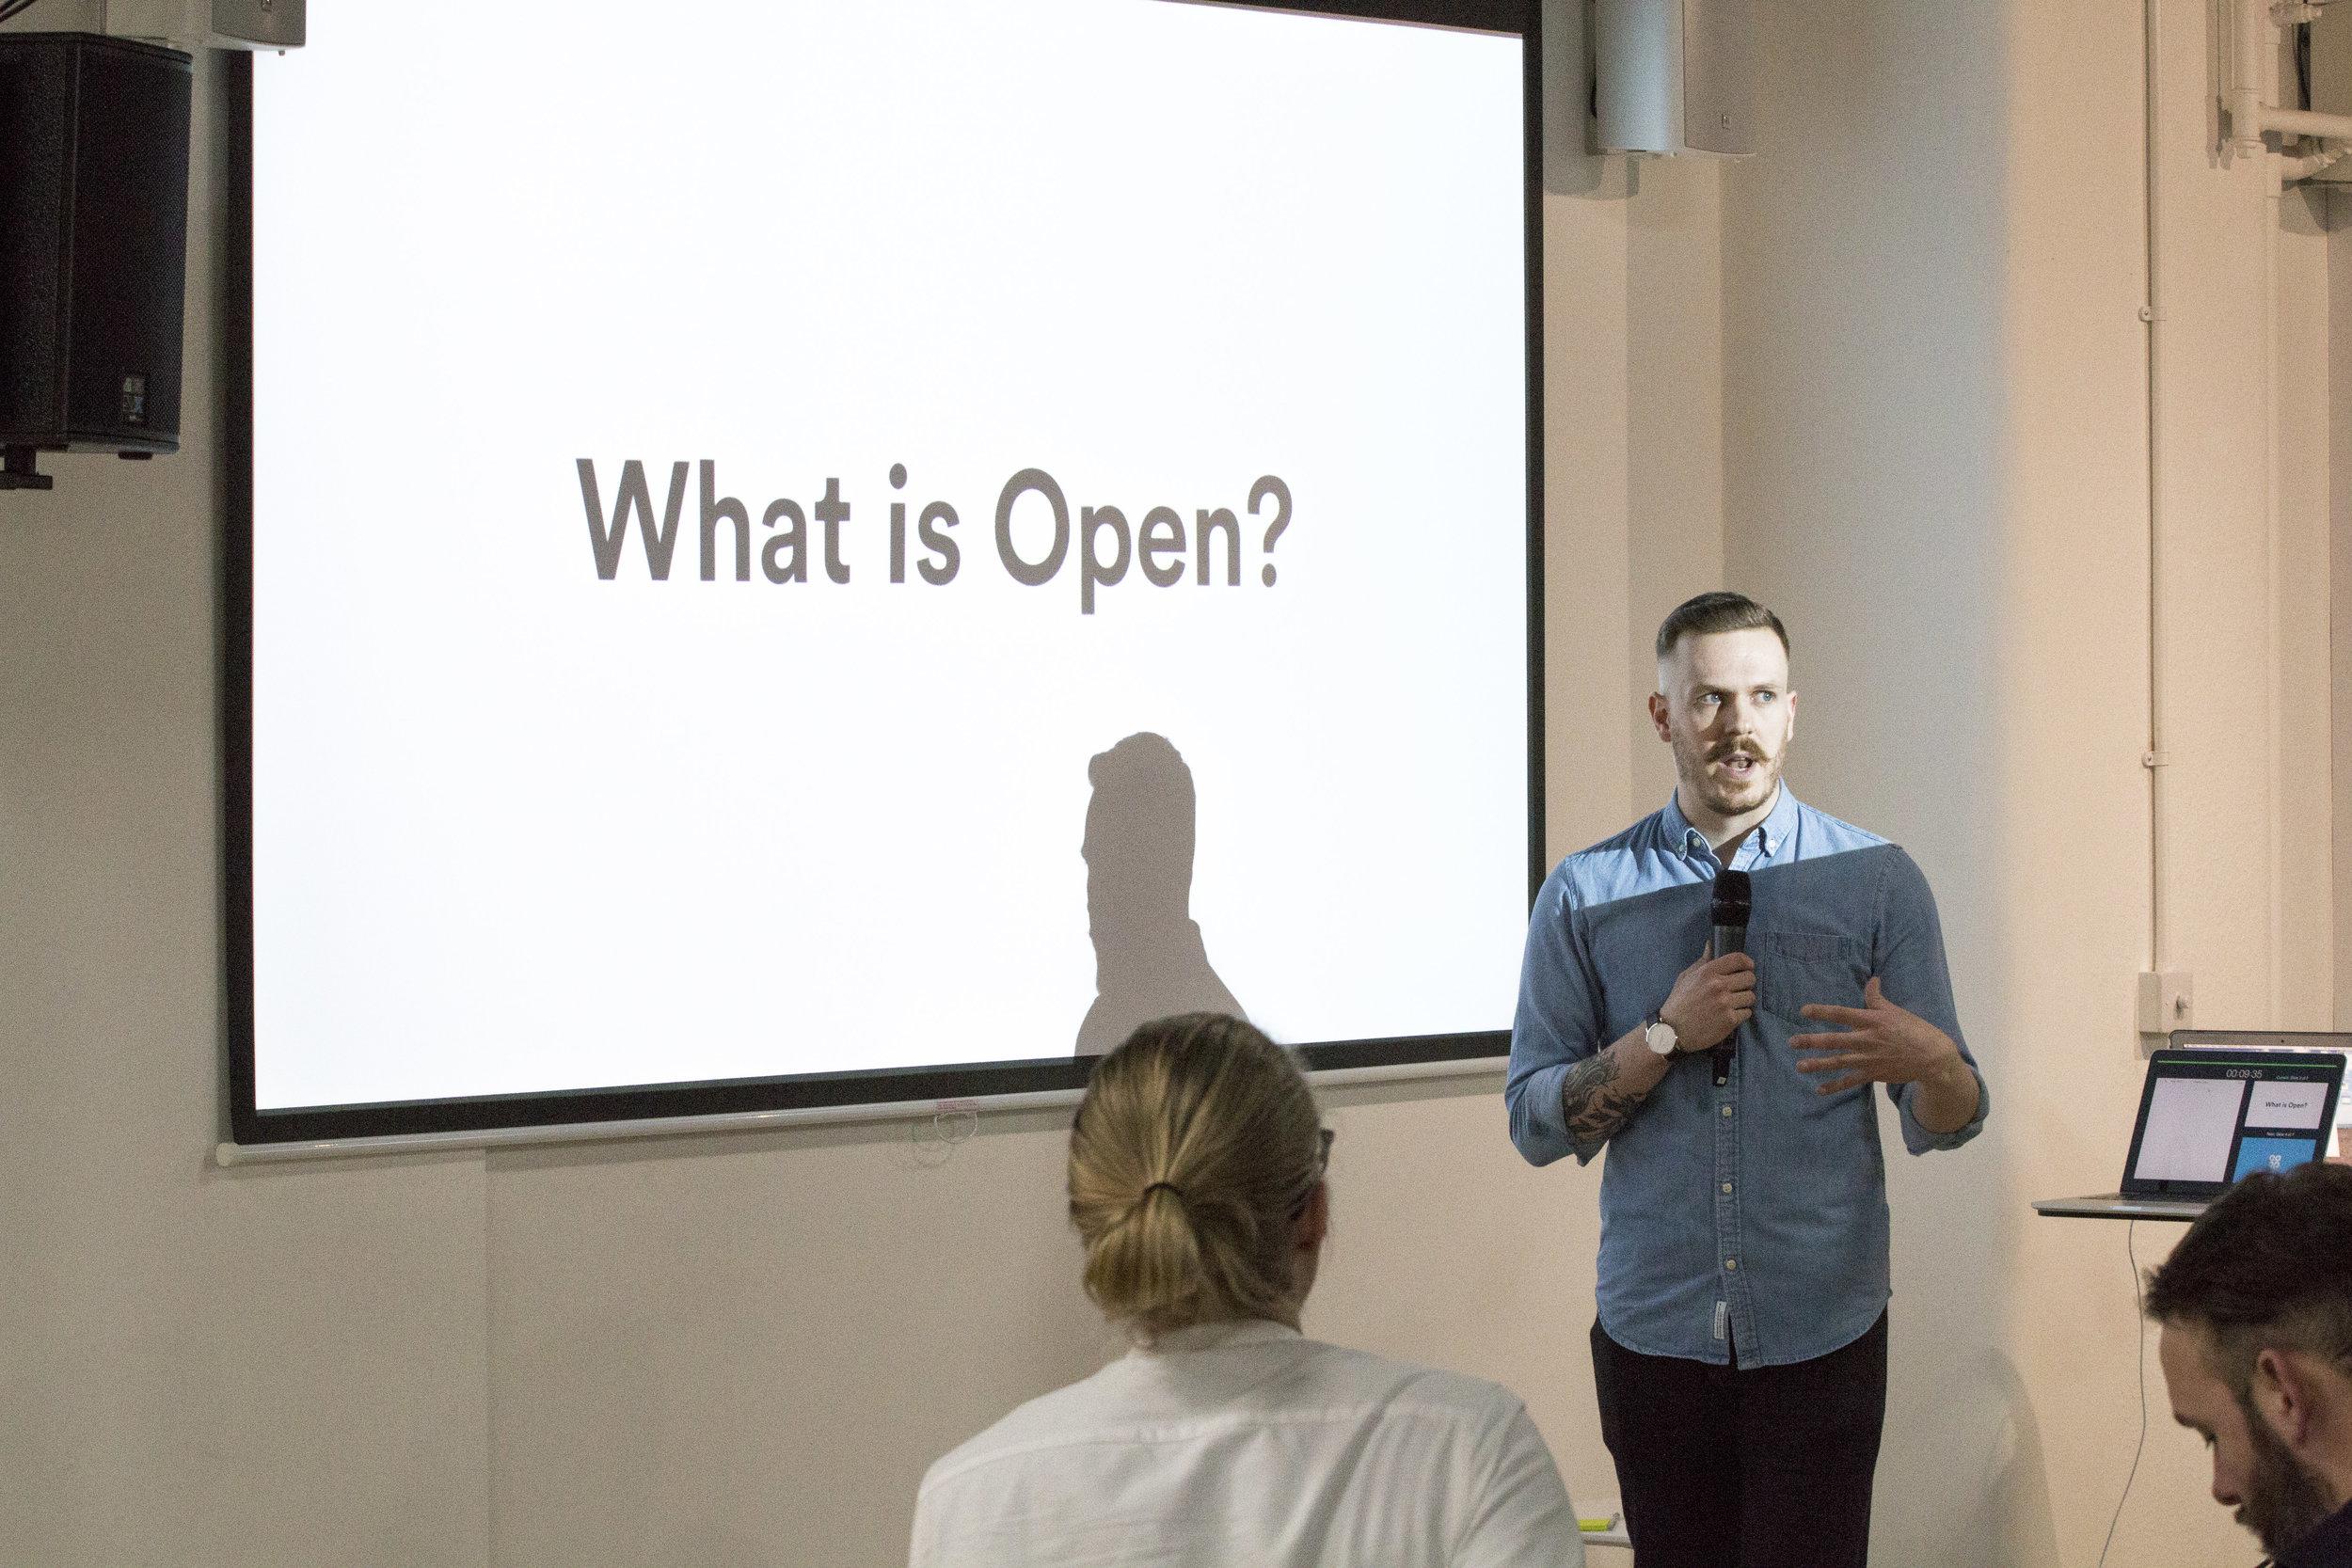 Open Mcr - photographed by Ben Brosnan